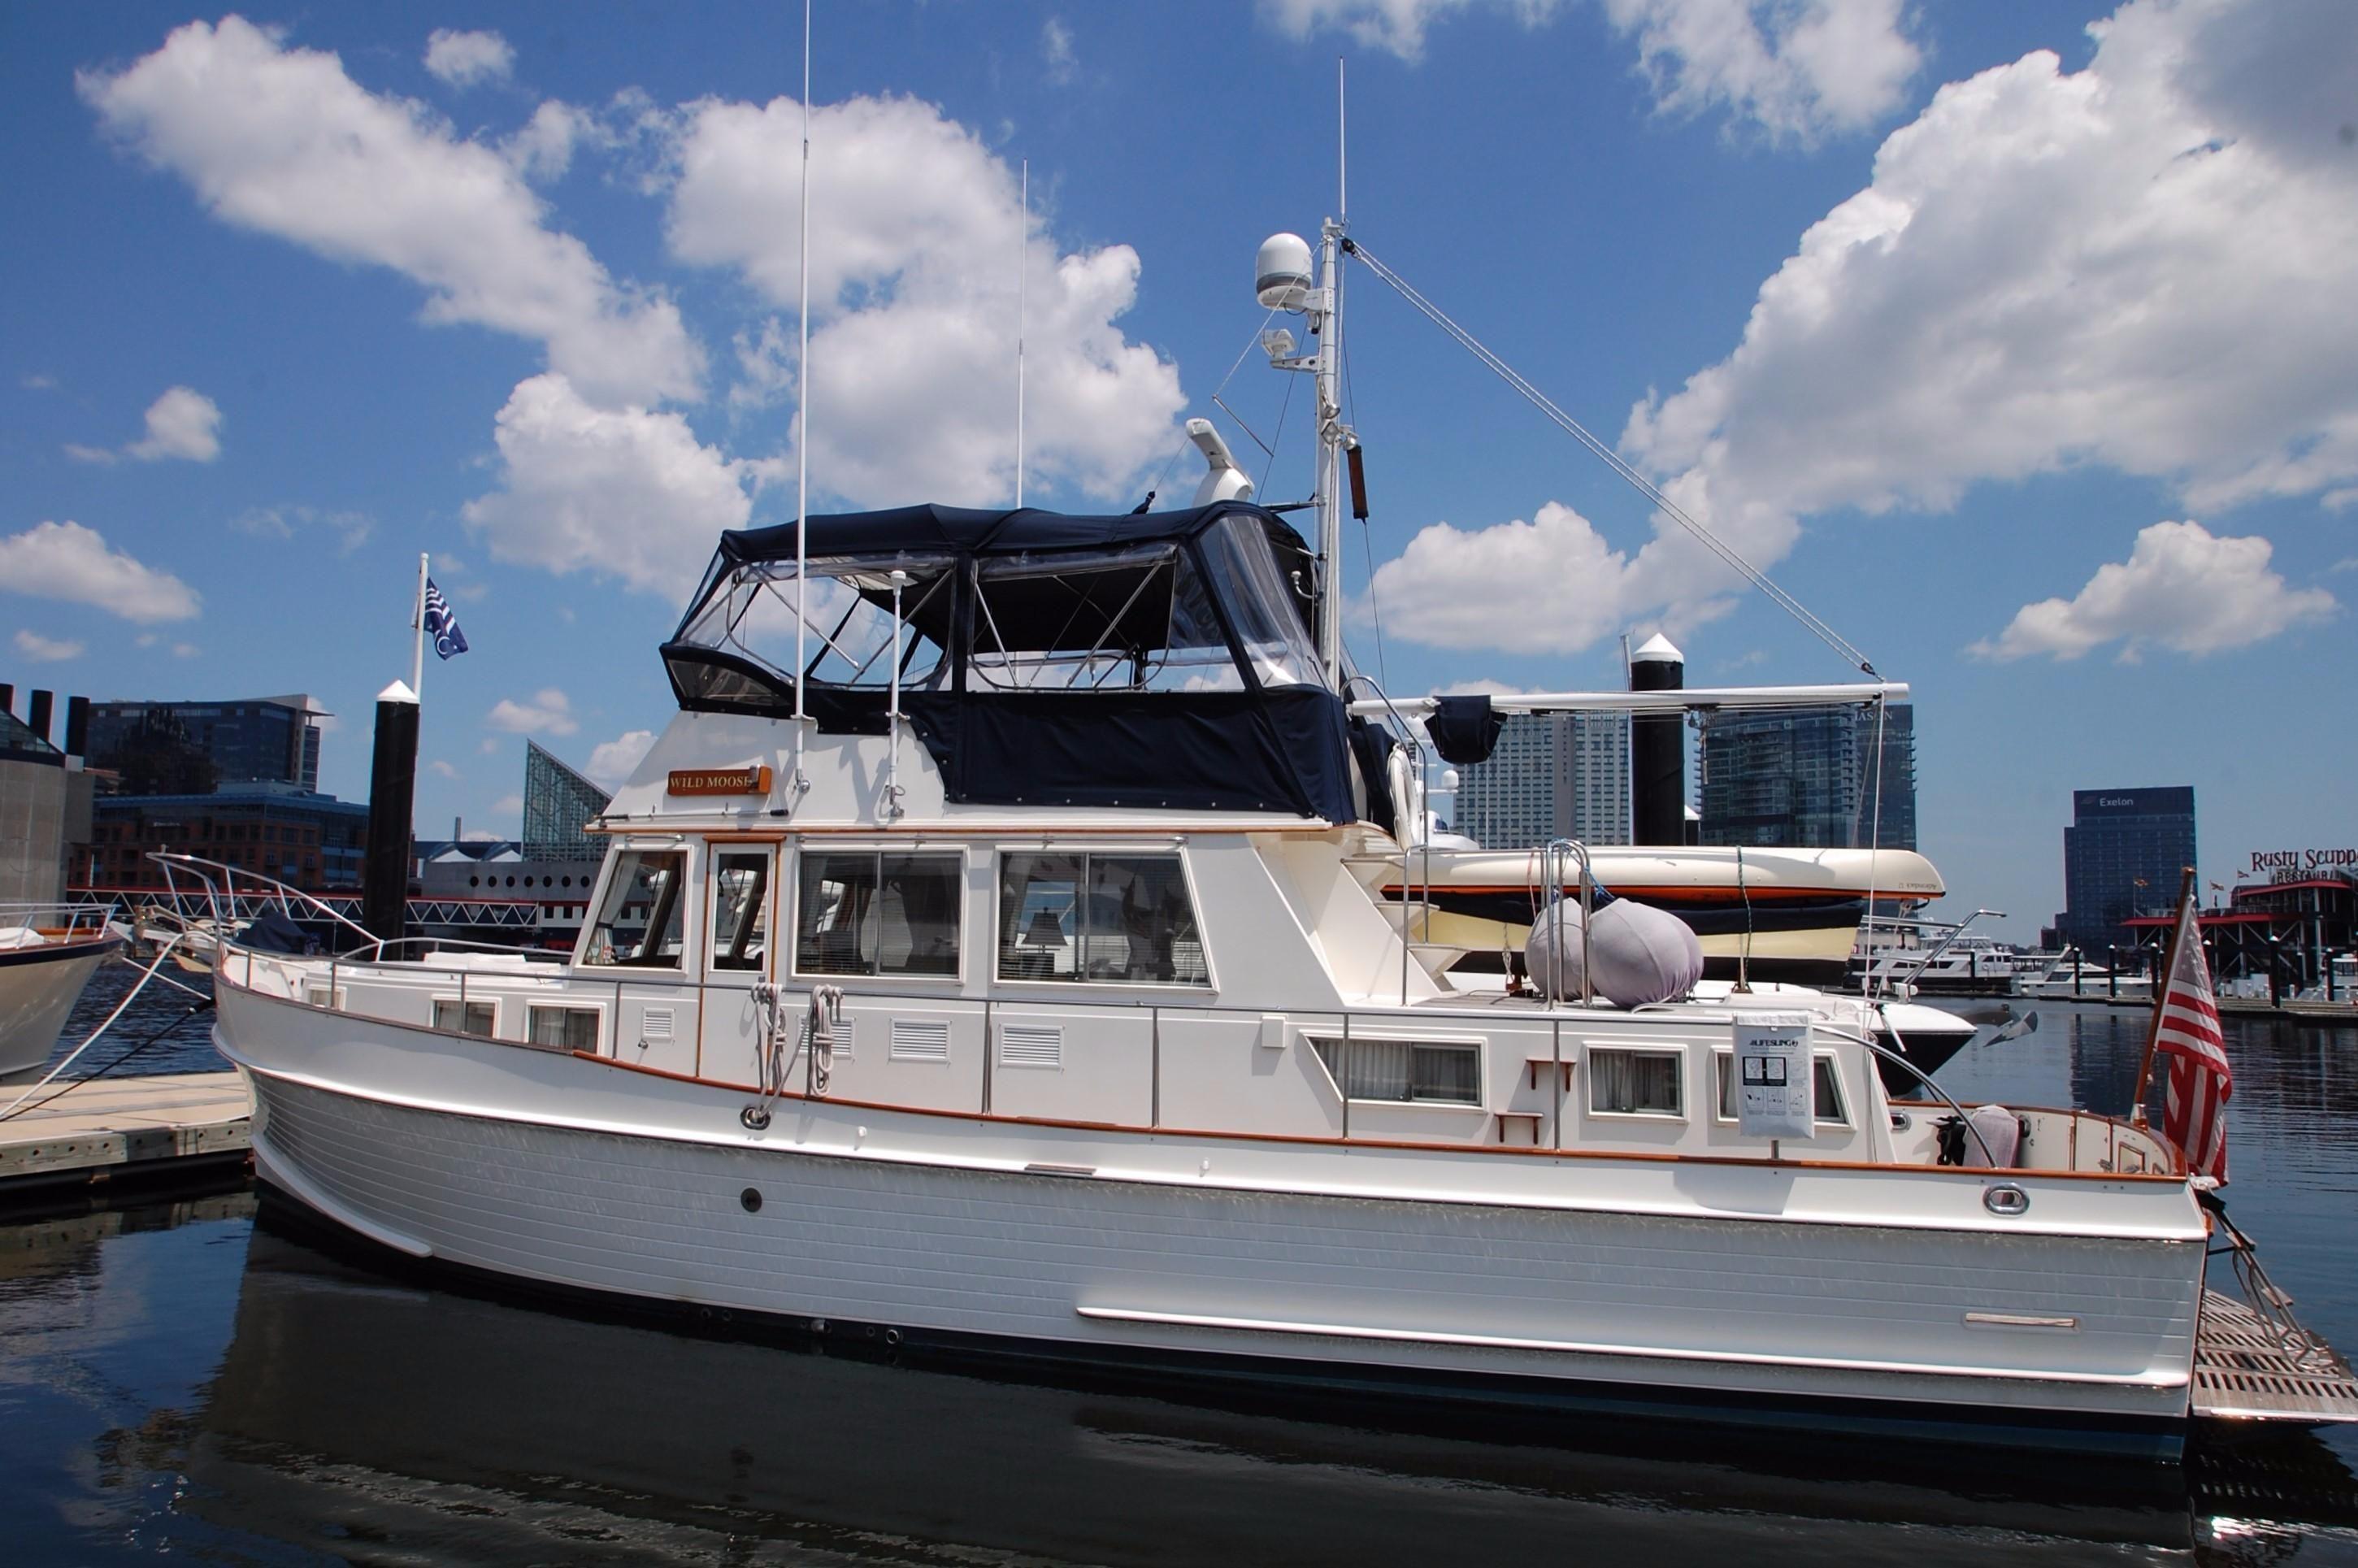 water hinckley barrier robb speed cabins s marine cruiser the motors report cabin break boat sport boats